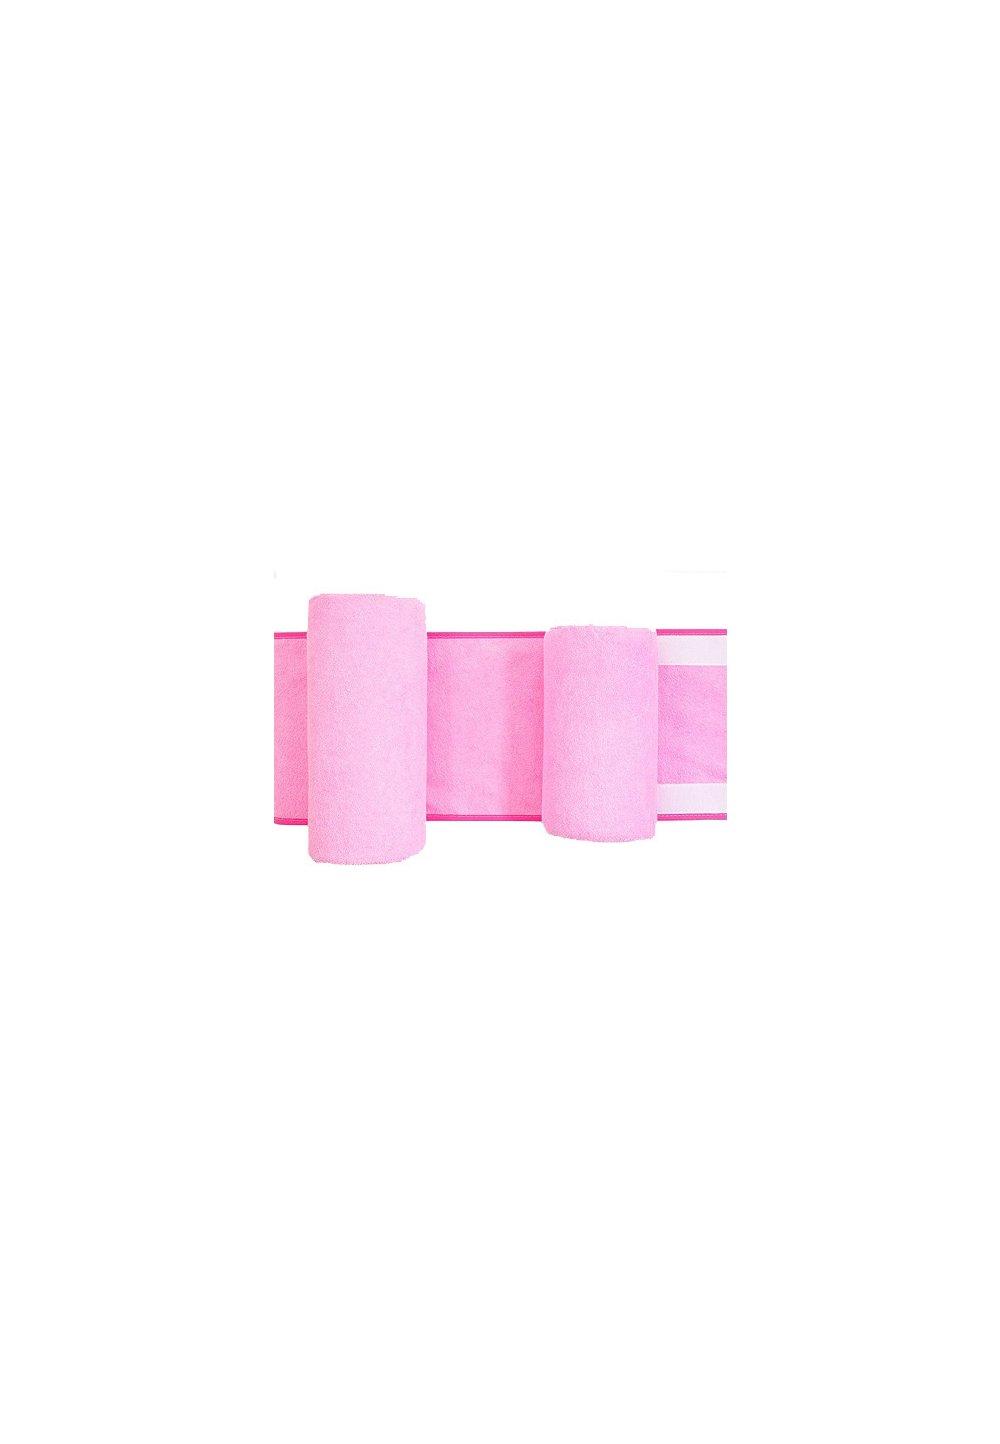 Perna suport, anti-rasturnare, roz imagine